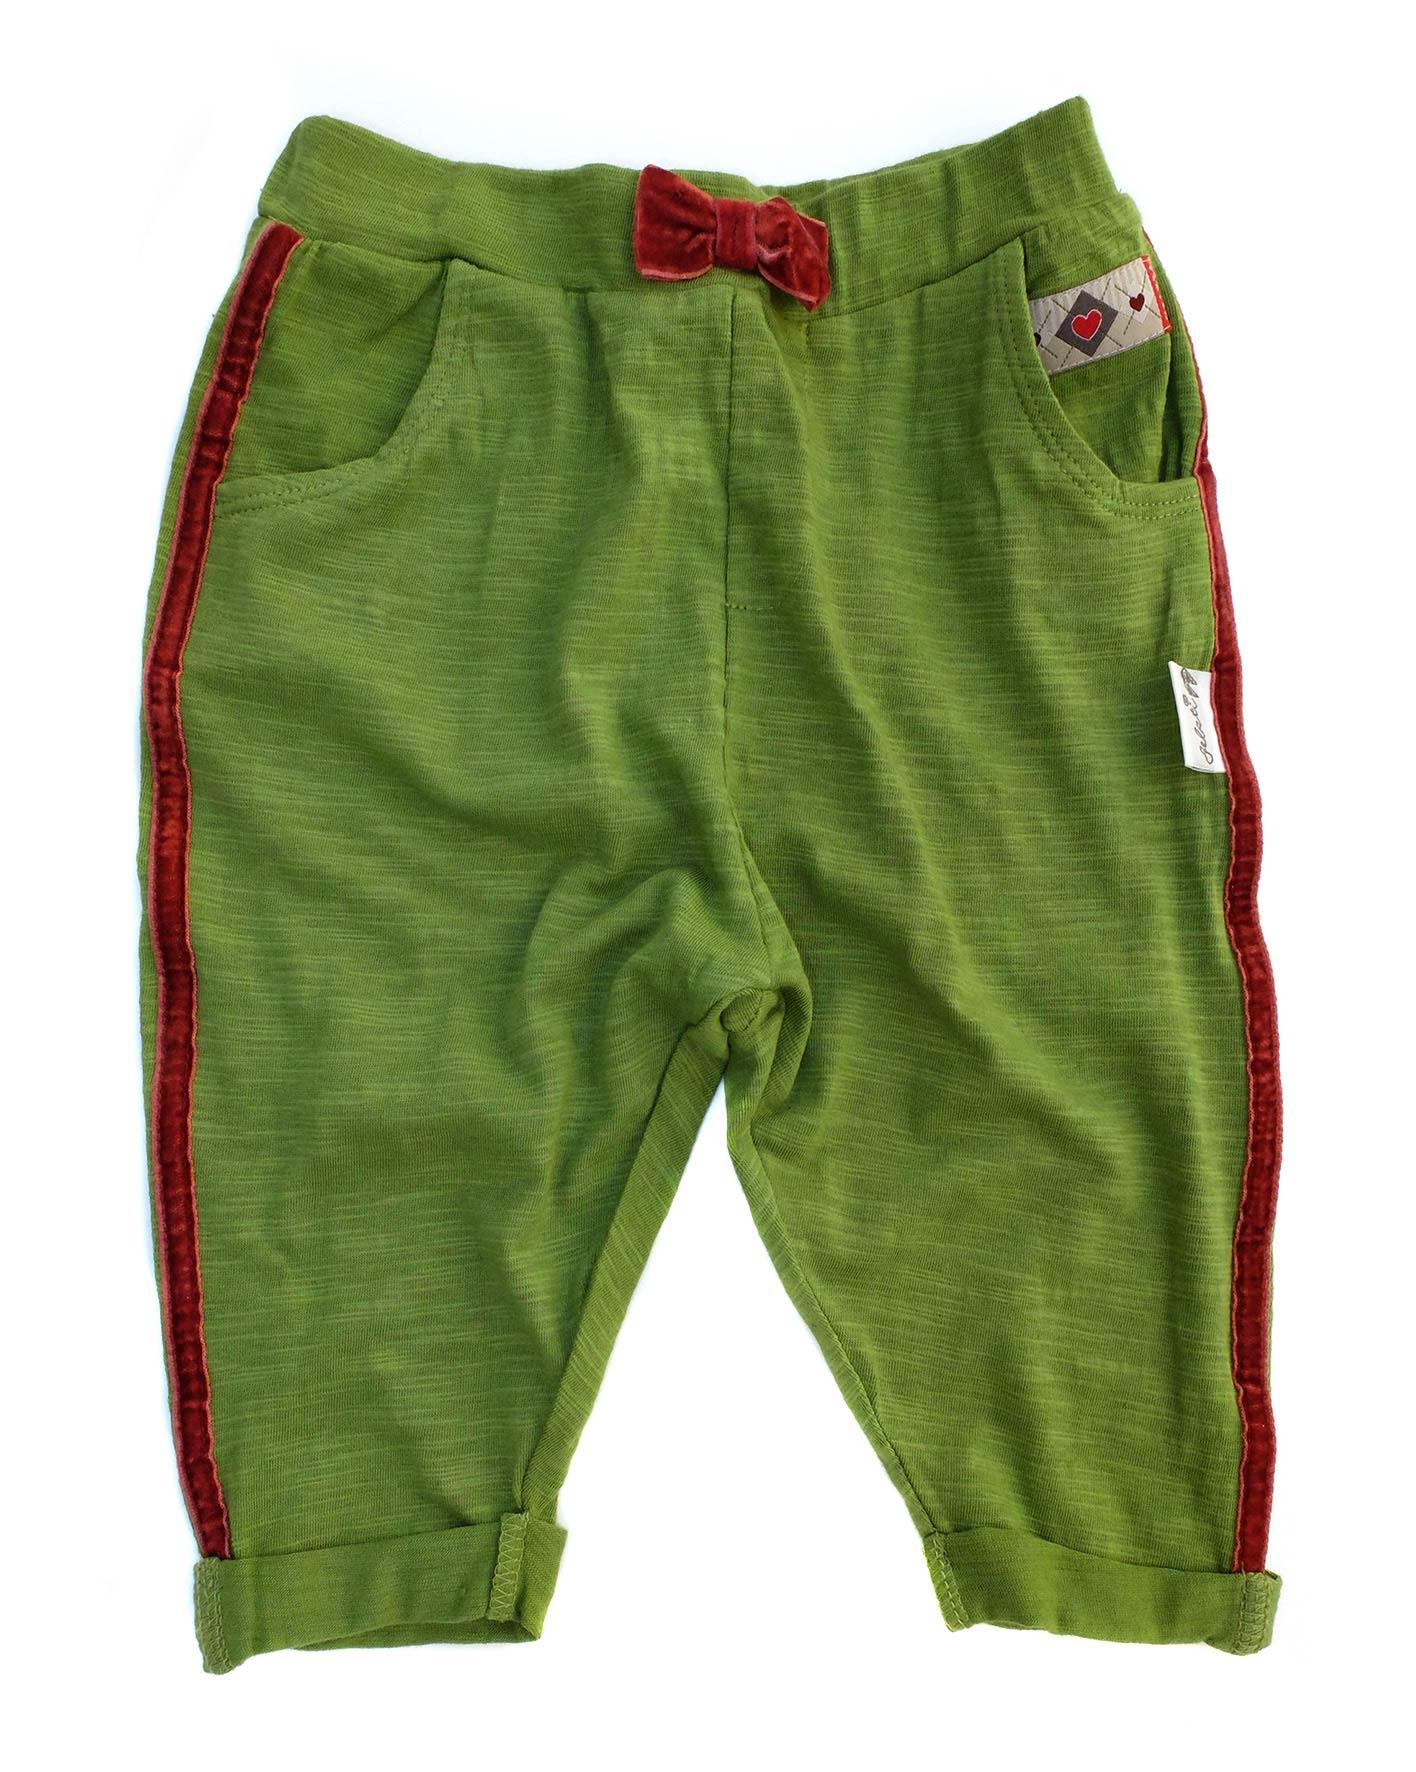 100a613bf32 Gelati Dievčenské nohavice s mašličkou - zelené